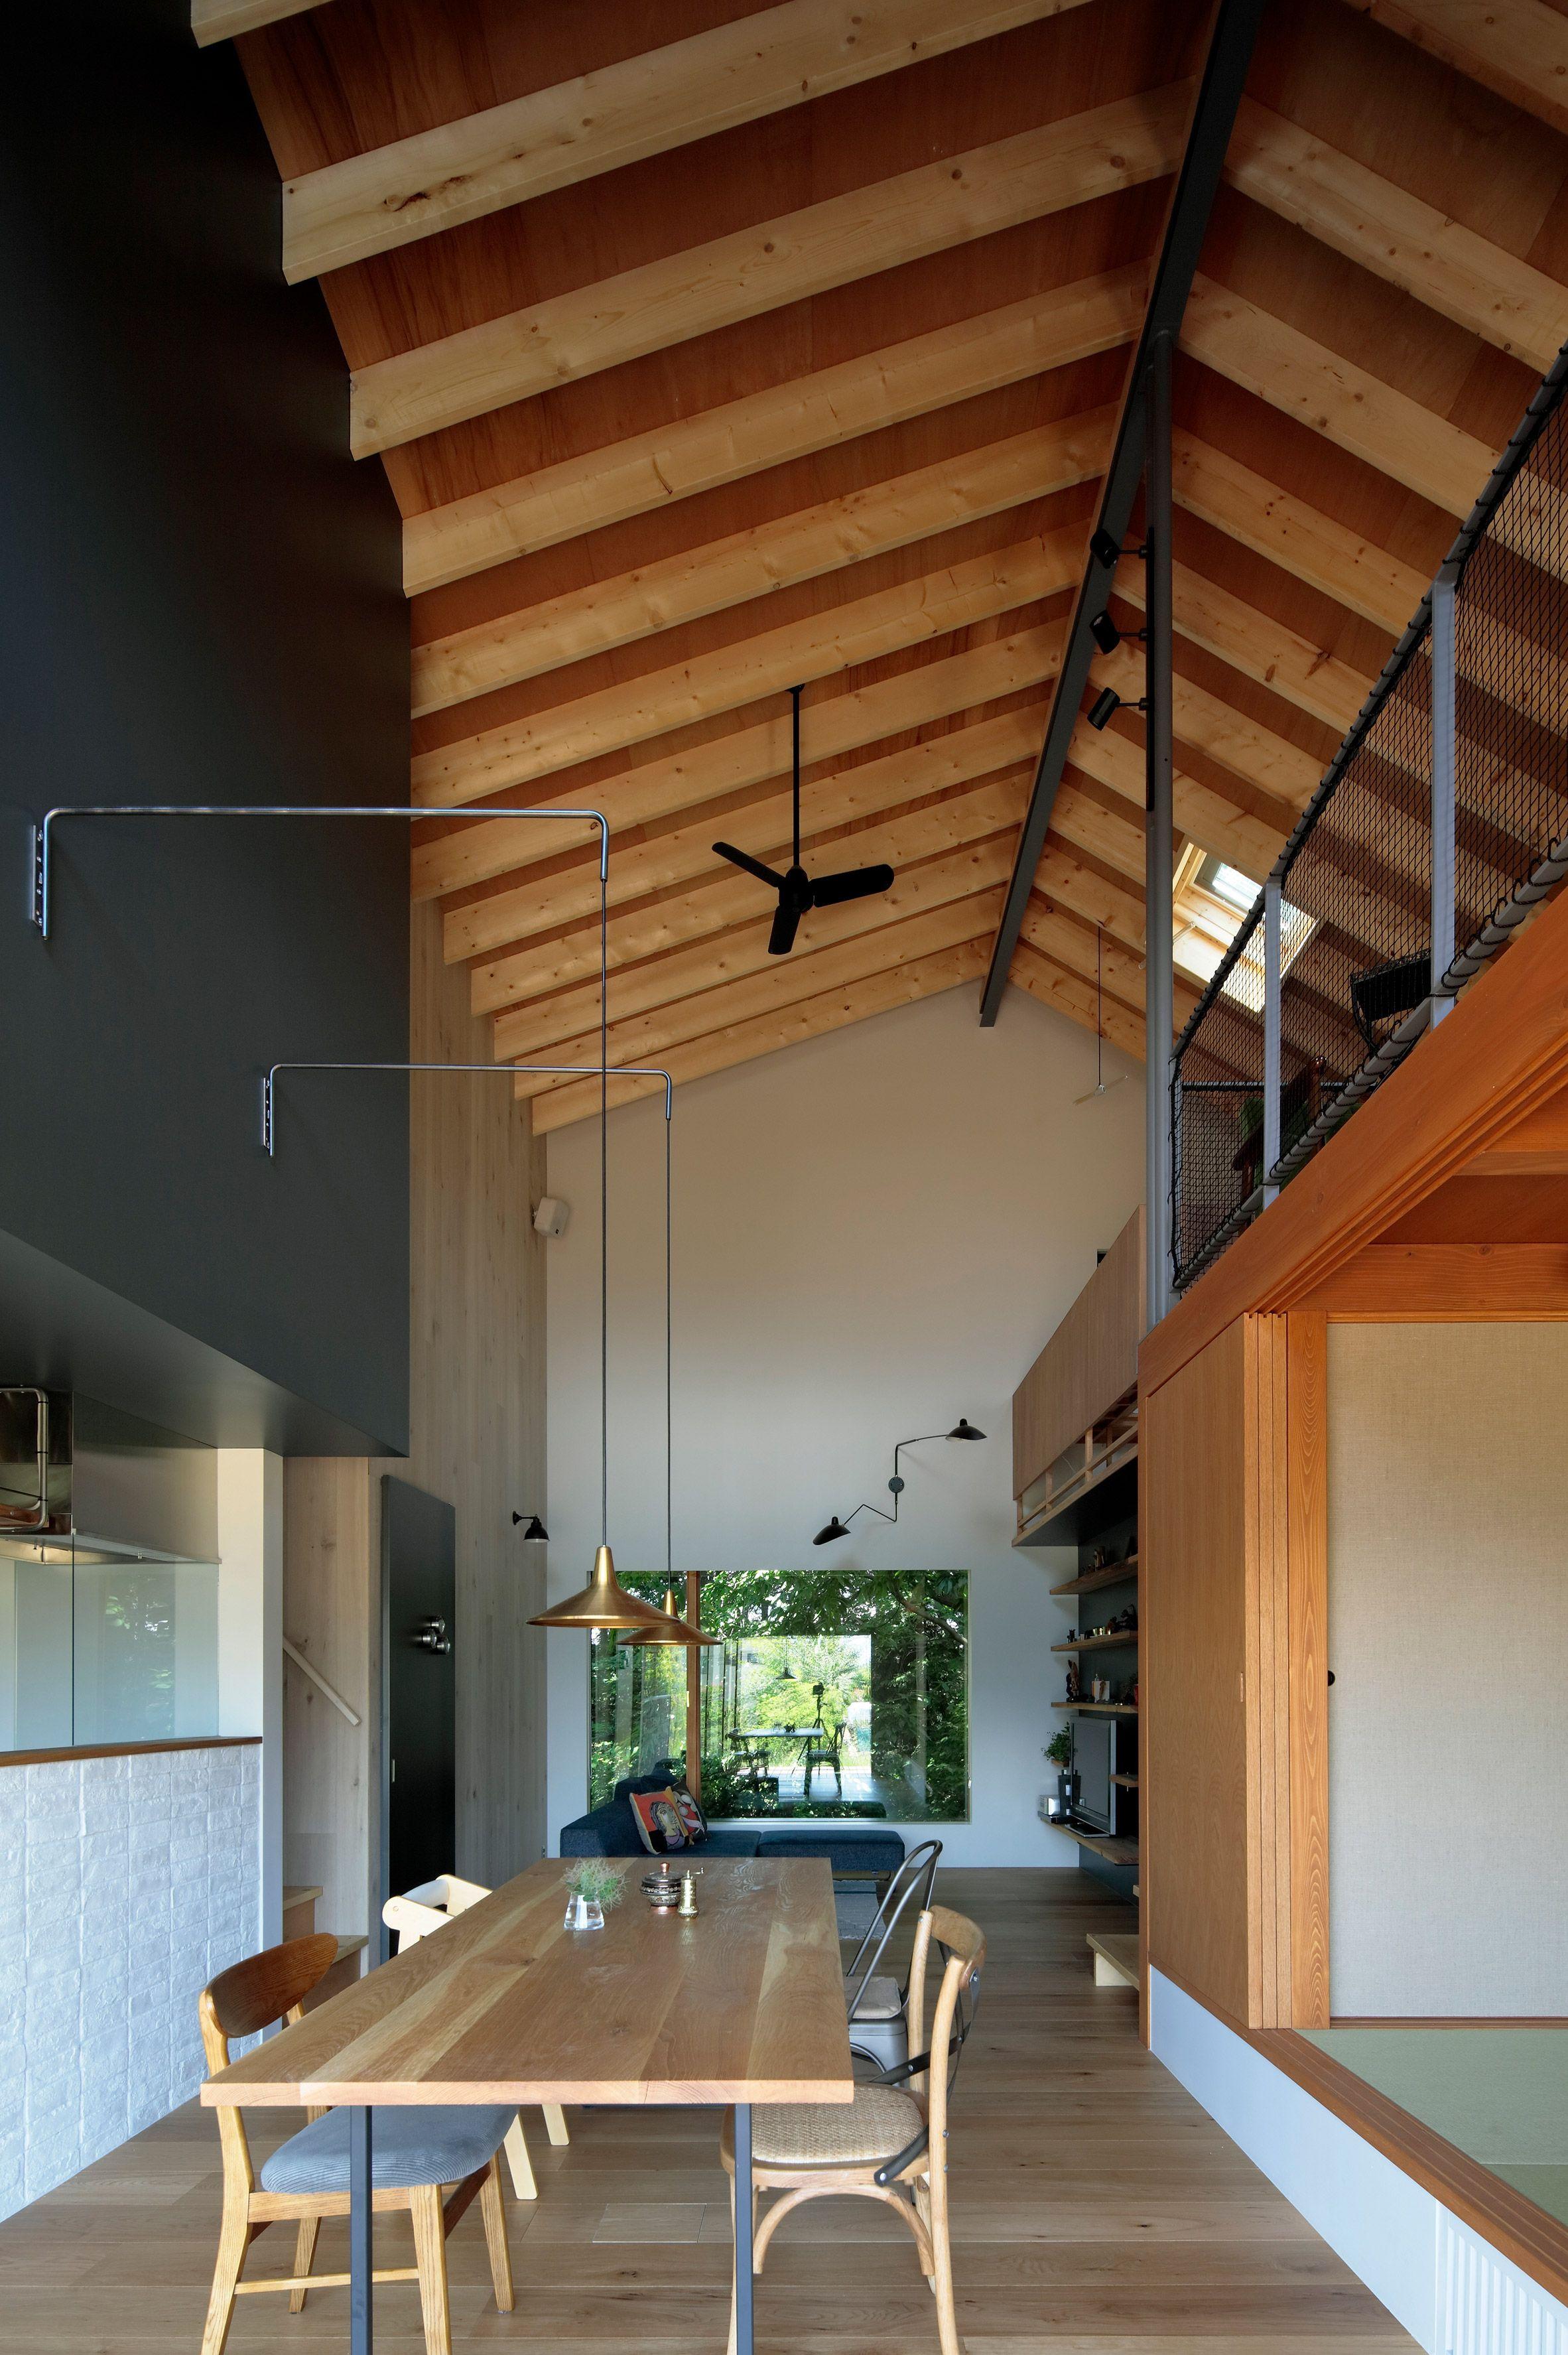 Photography: Koichi Torimura ||| Sweet Home Make Interior Decoration, Interior  Design Ideas, Home Decor, Home Decoration Ideas, Design Decoration Ideas,  ...